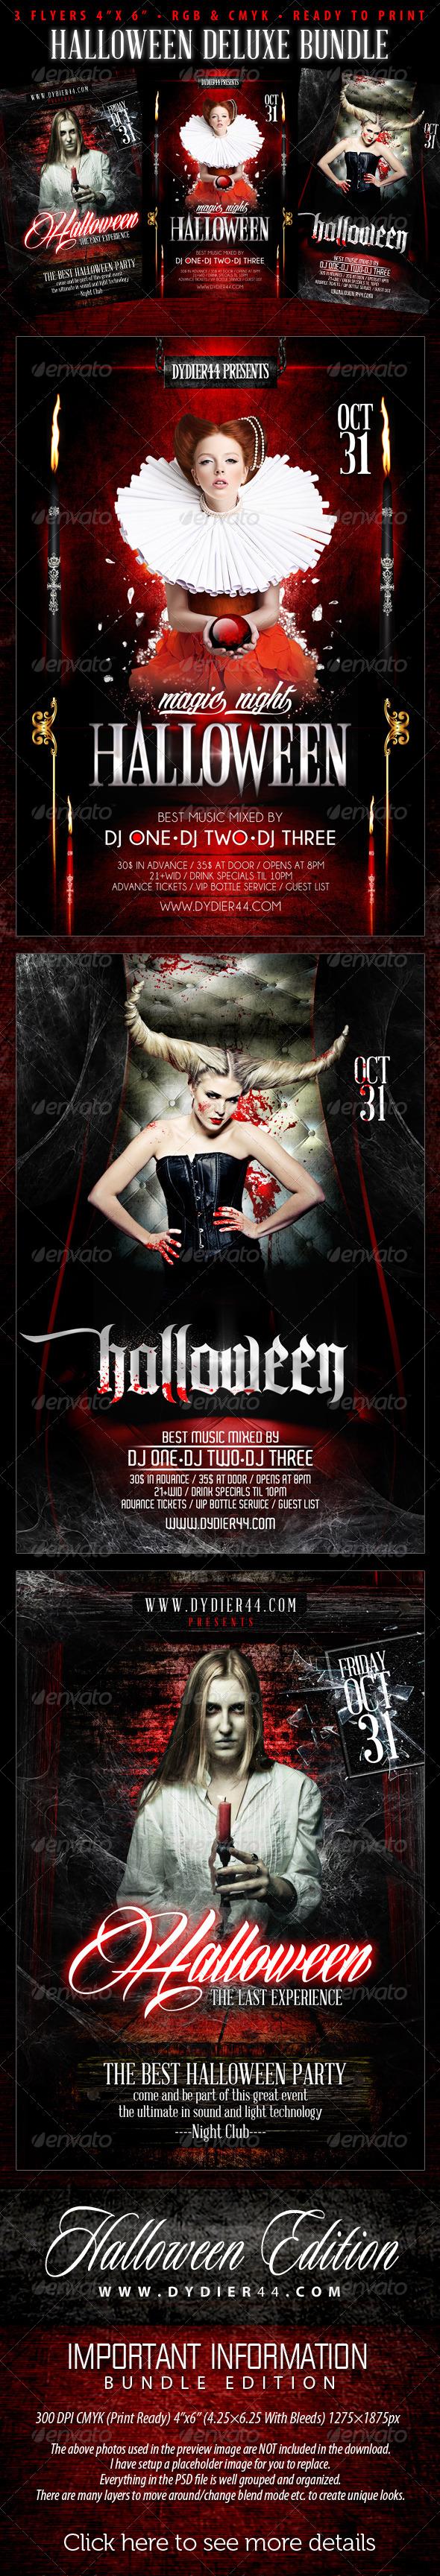 Halloween Deluxe Bundle (4x6 Flyer Template) by Dydier44 ...